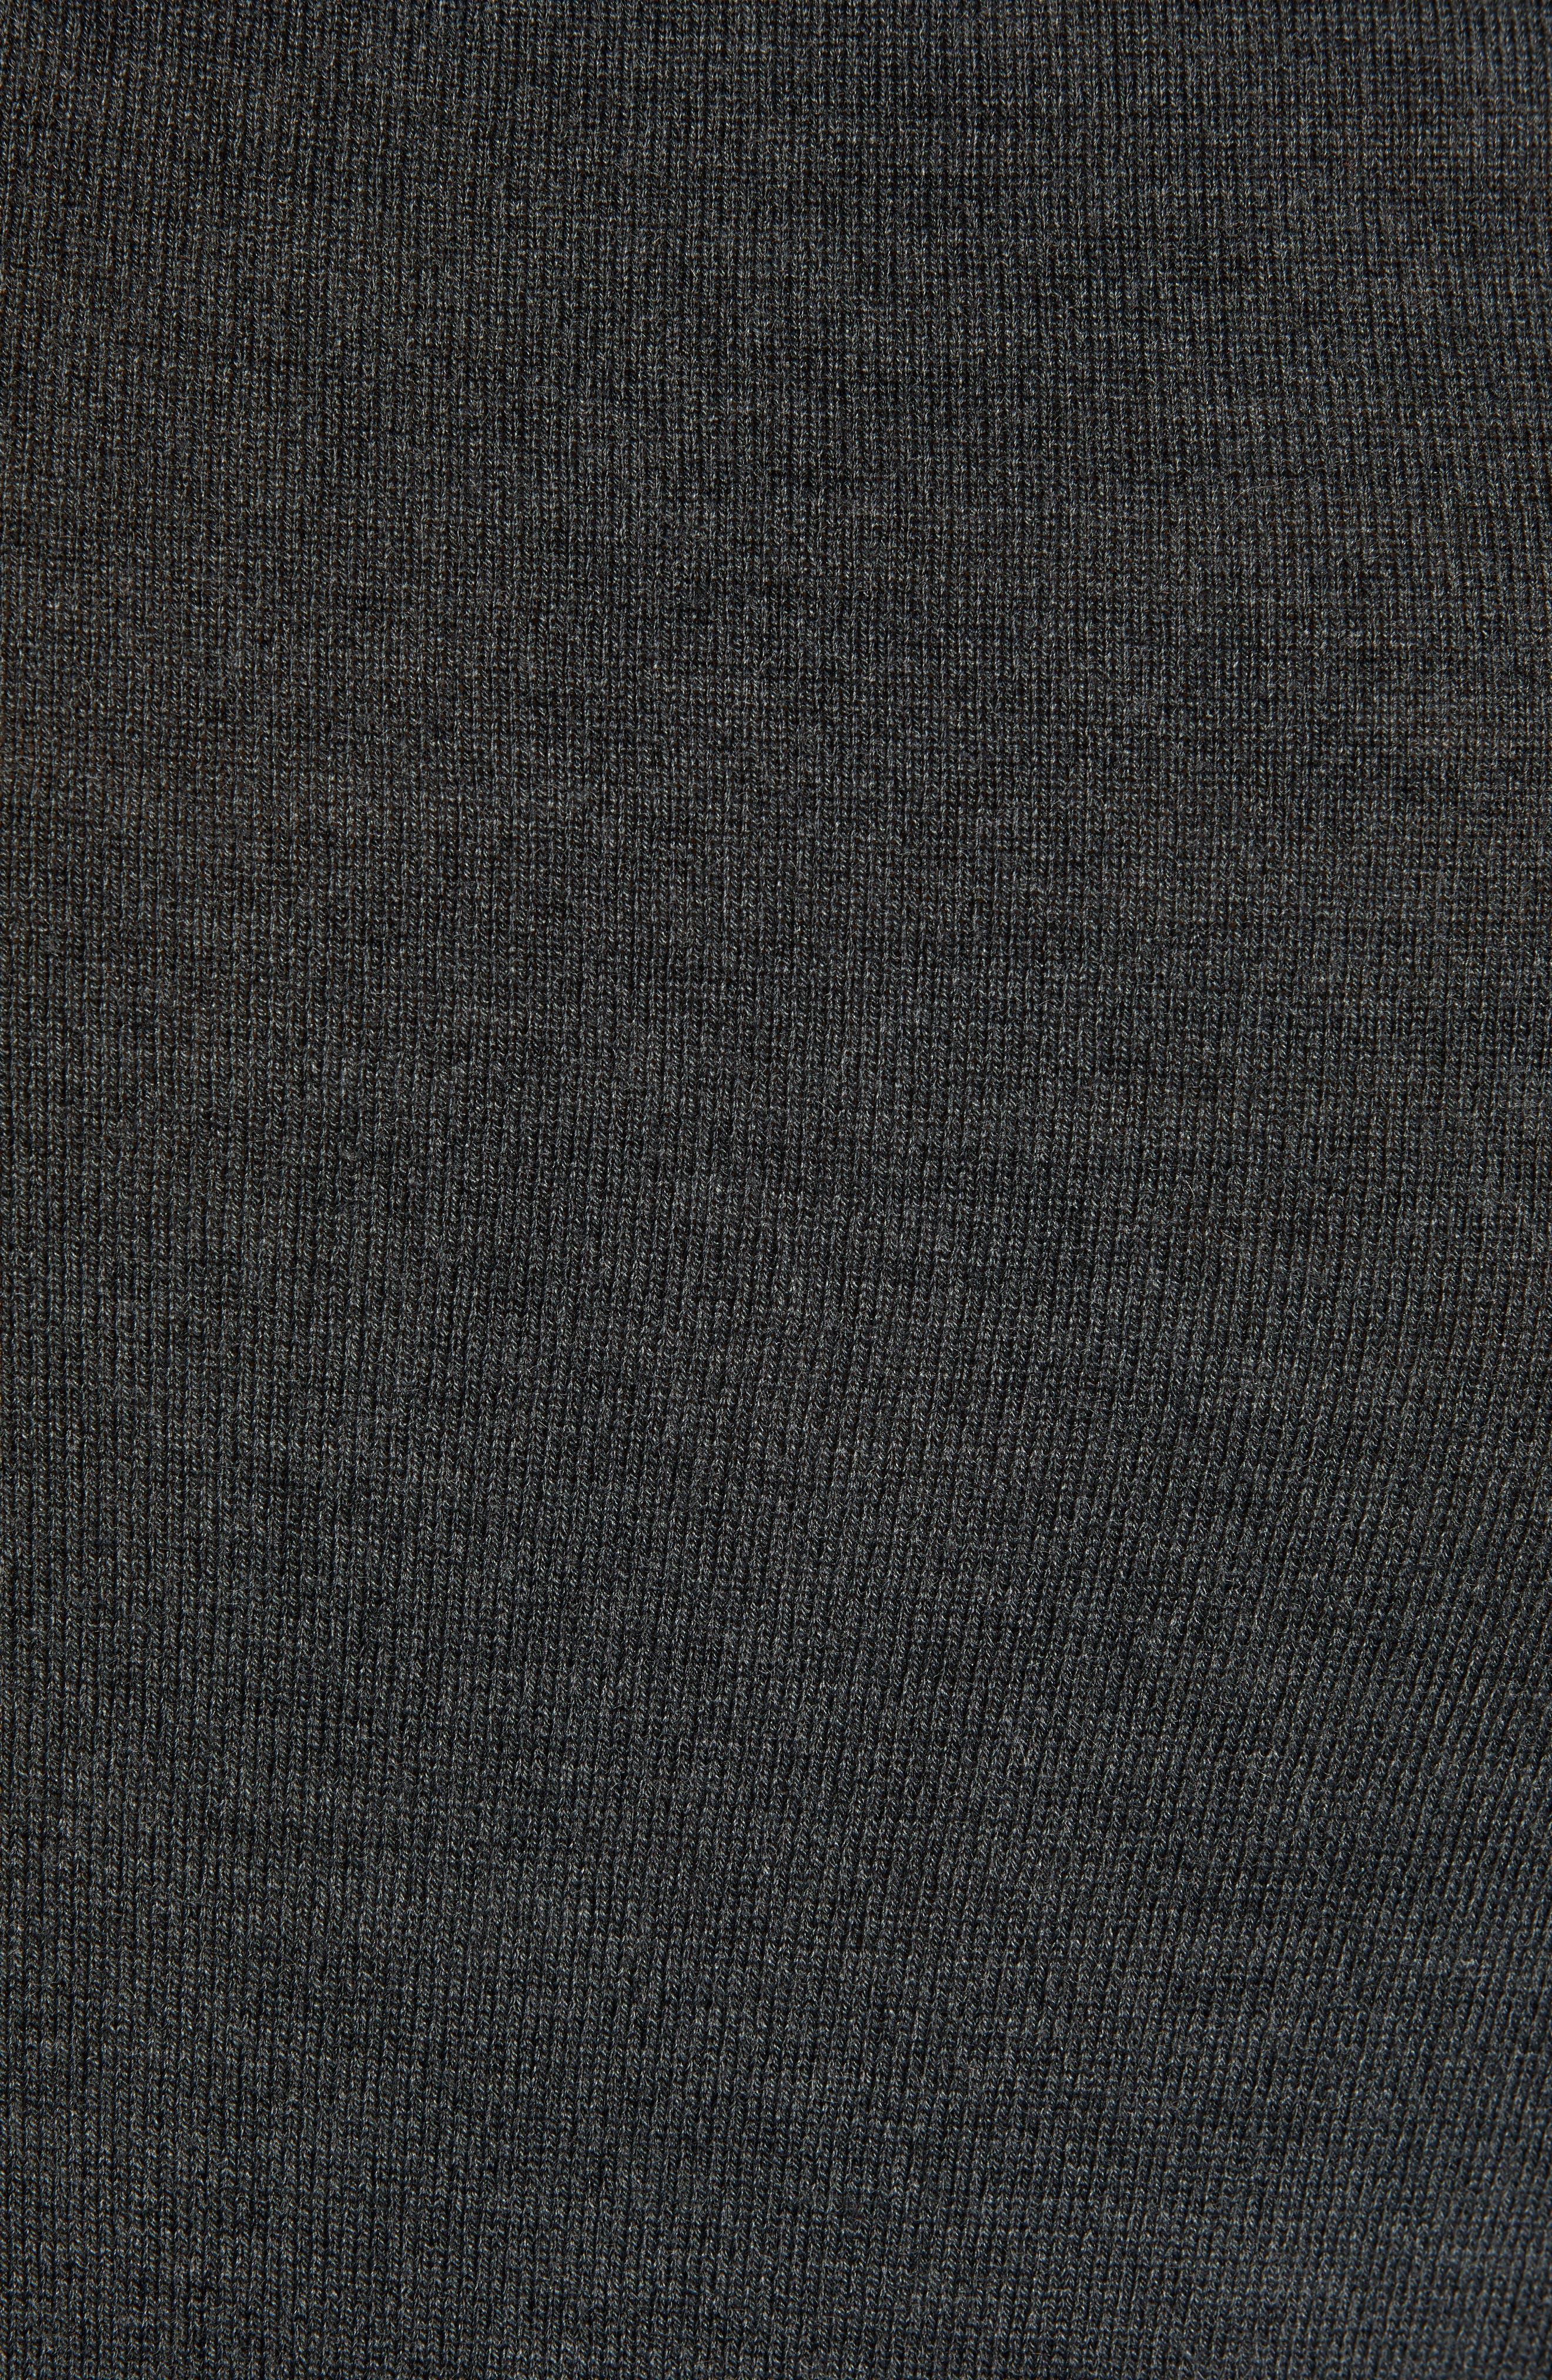 VINCE CAMUTO, Merino Wool Turtleneck, Alternate thumbnail 6, color, CHARCOAL